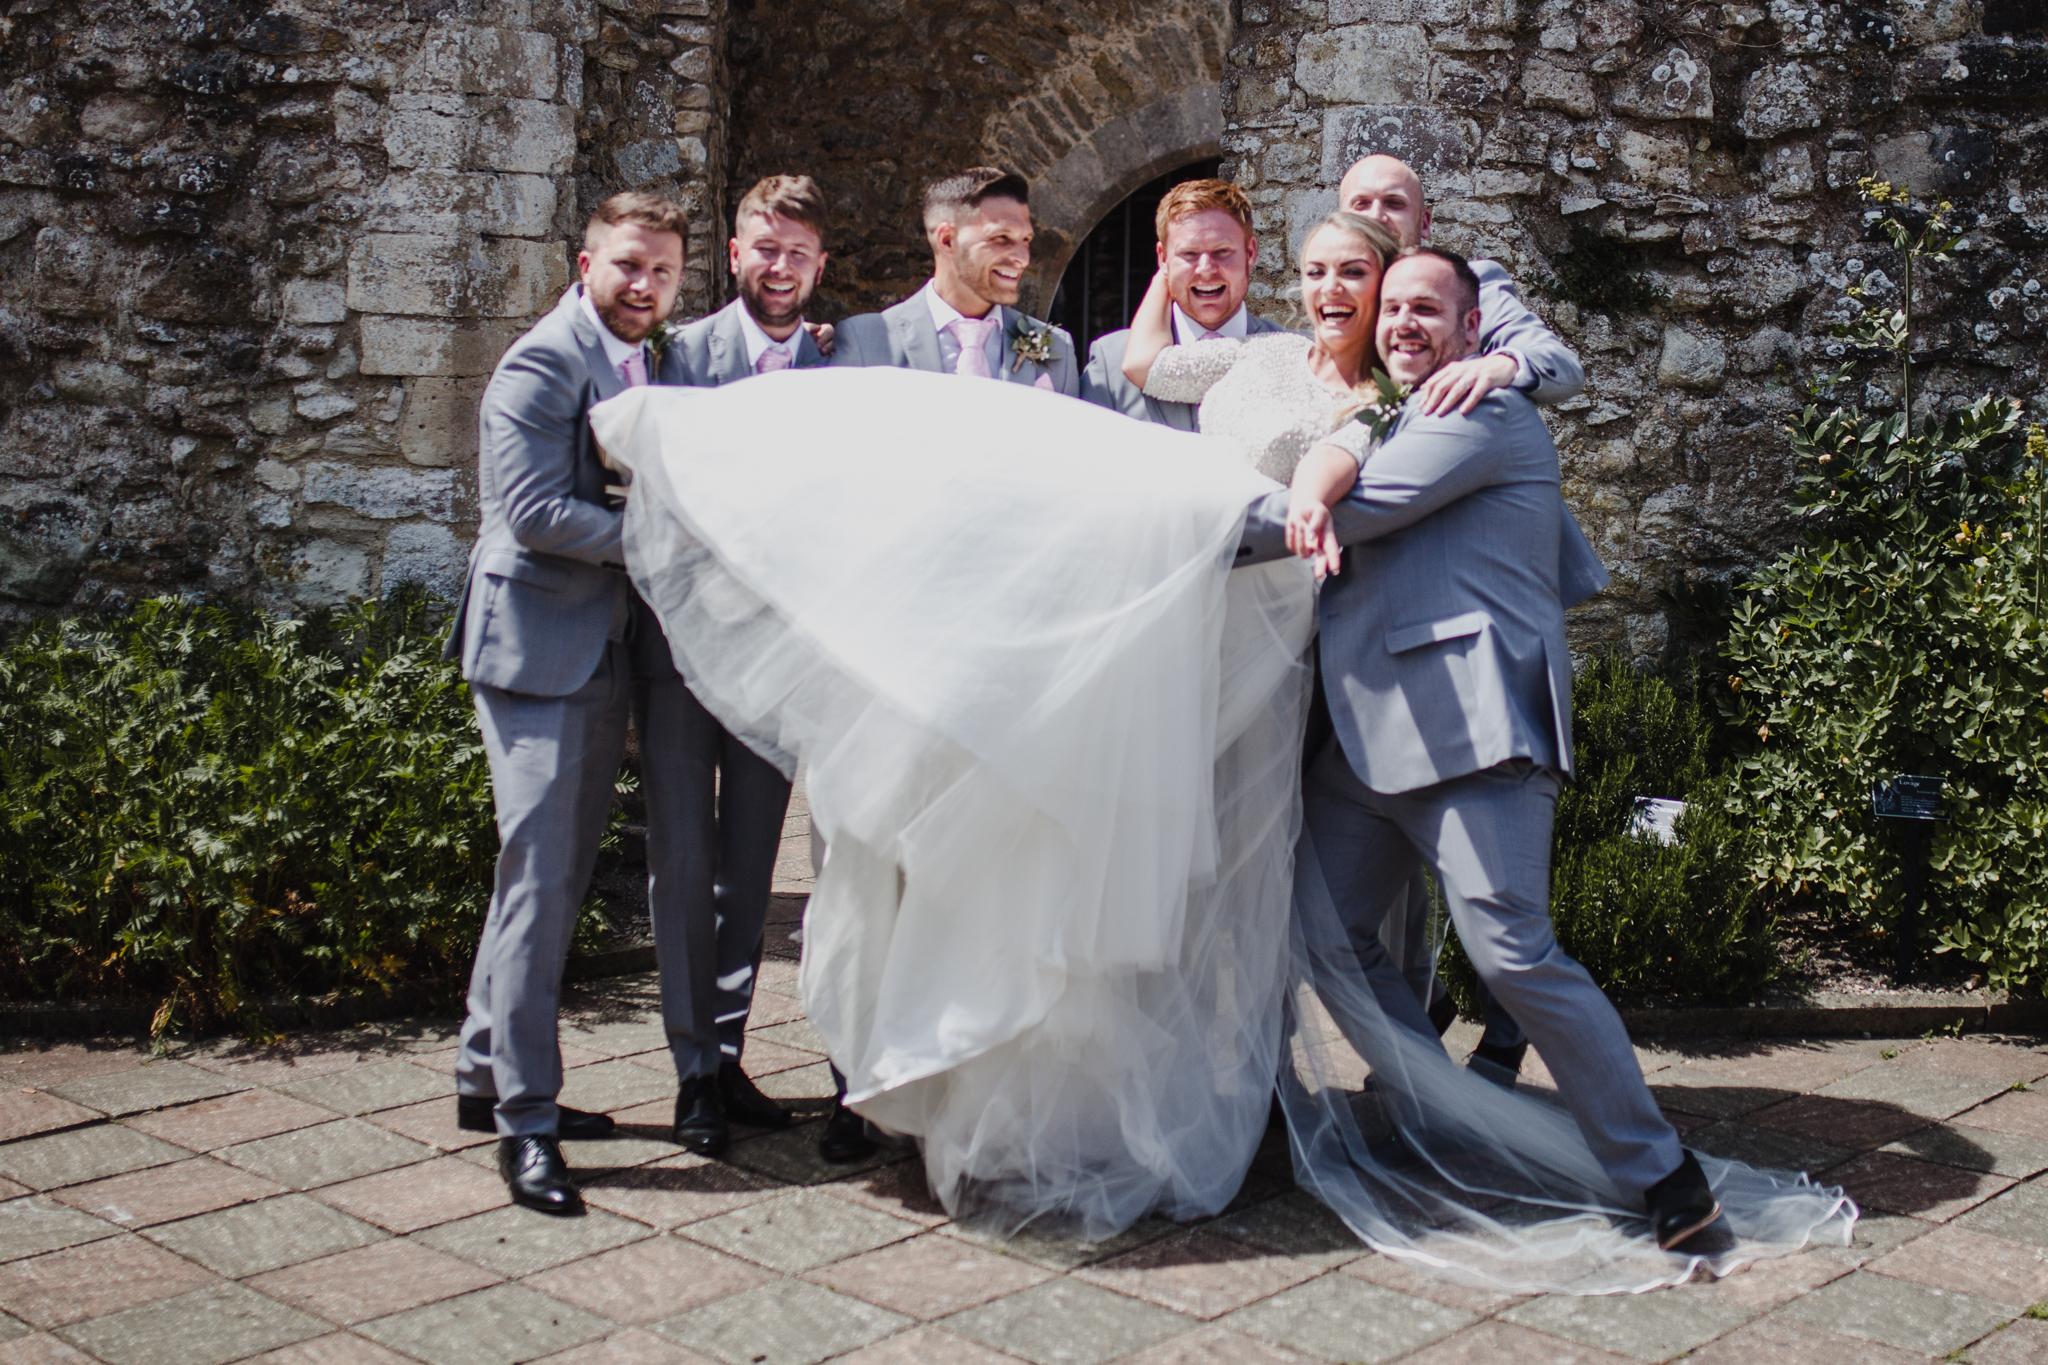 Groomsmen lifting up the bride in outdoor venue